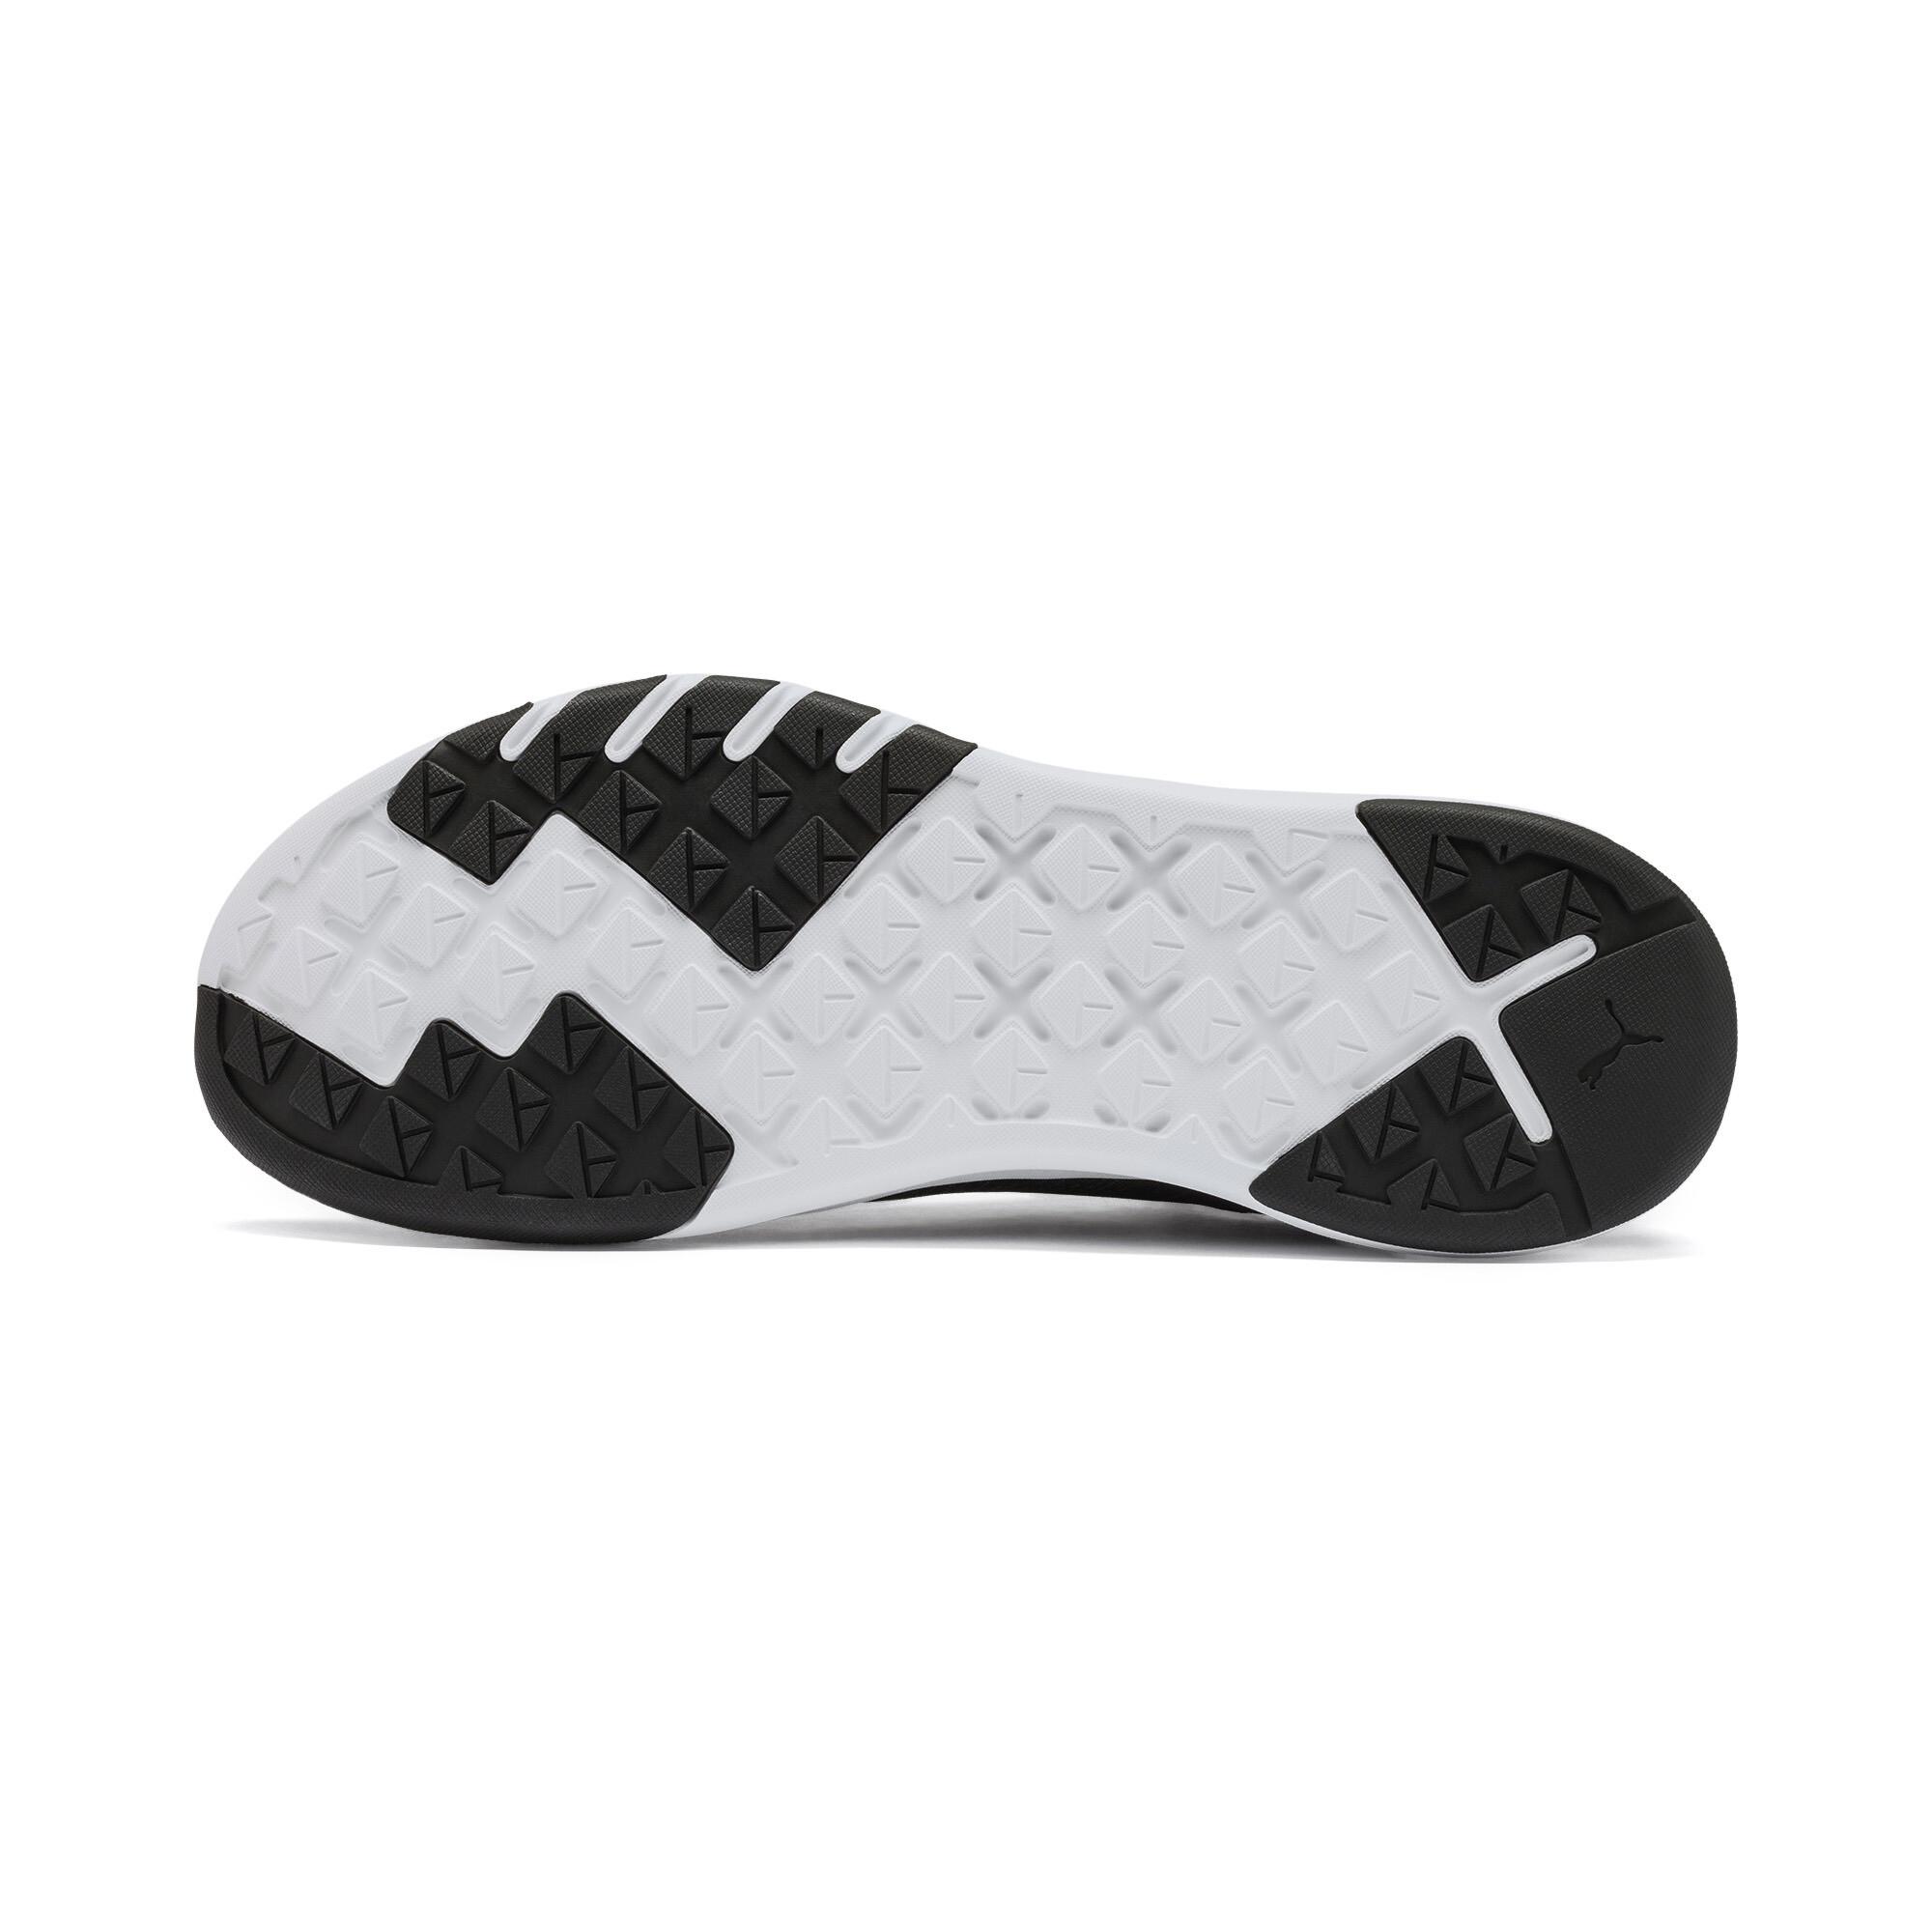 PUMA-Men-039-s-IGNITE-Contender-Knit-Running-Shoes thumbnail 11